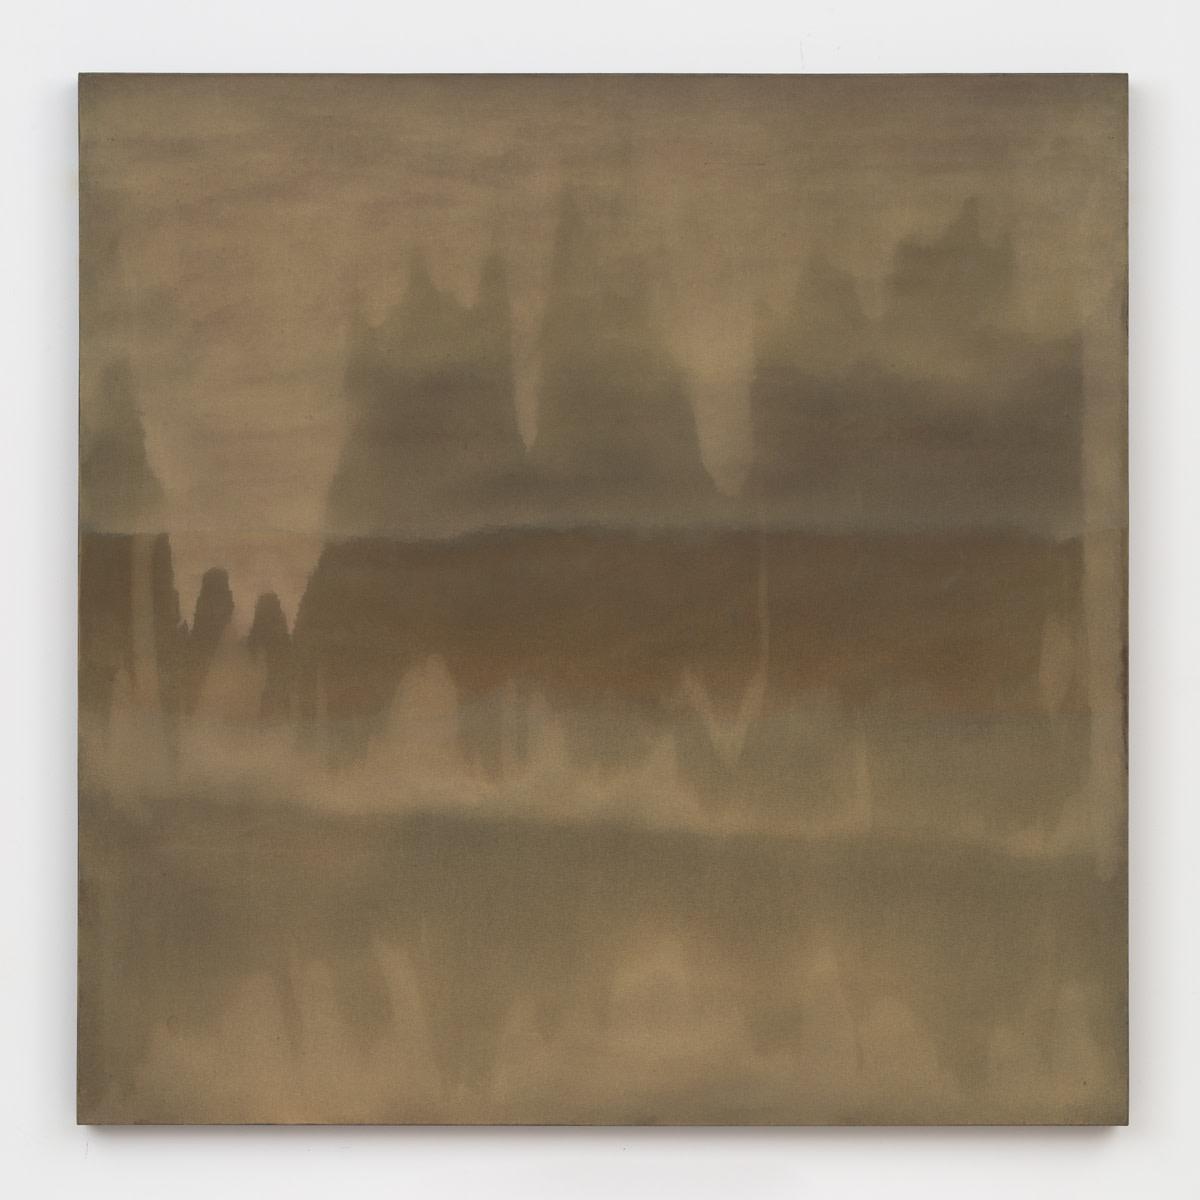 Virginia Jaramillo Thira, 1975 Acrylic on canvas 152.4 x 152.4 cm 60 x 60 in Inquire